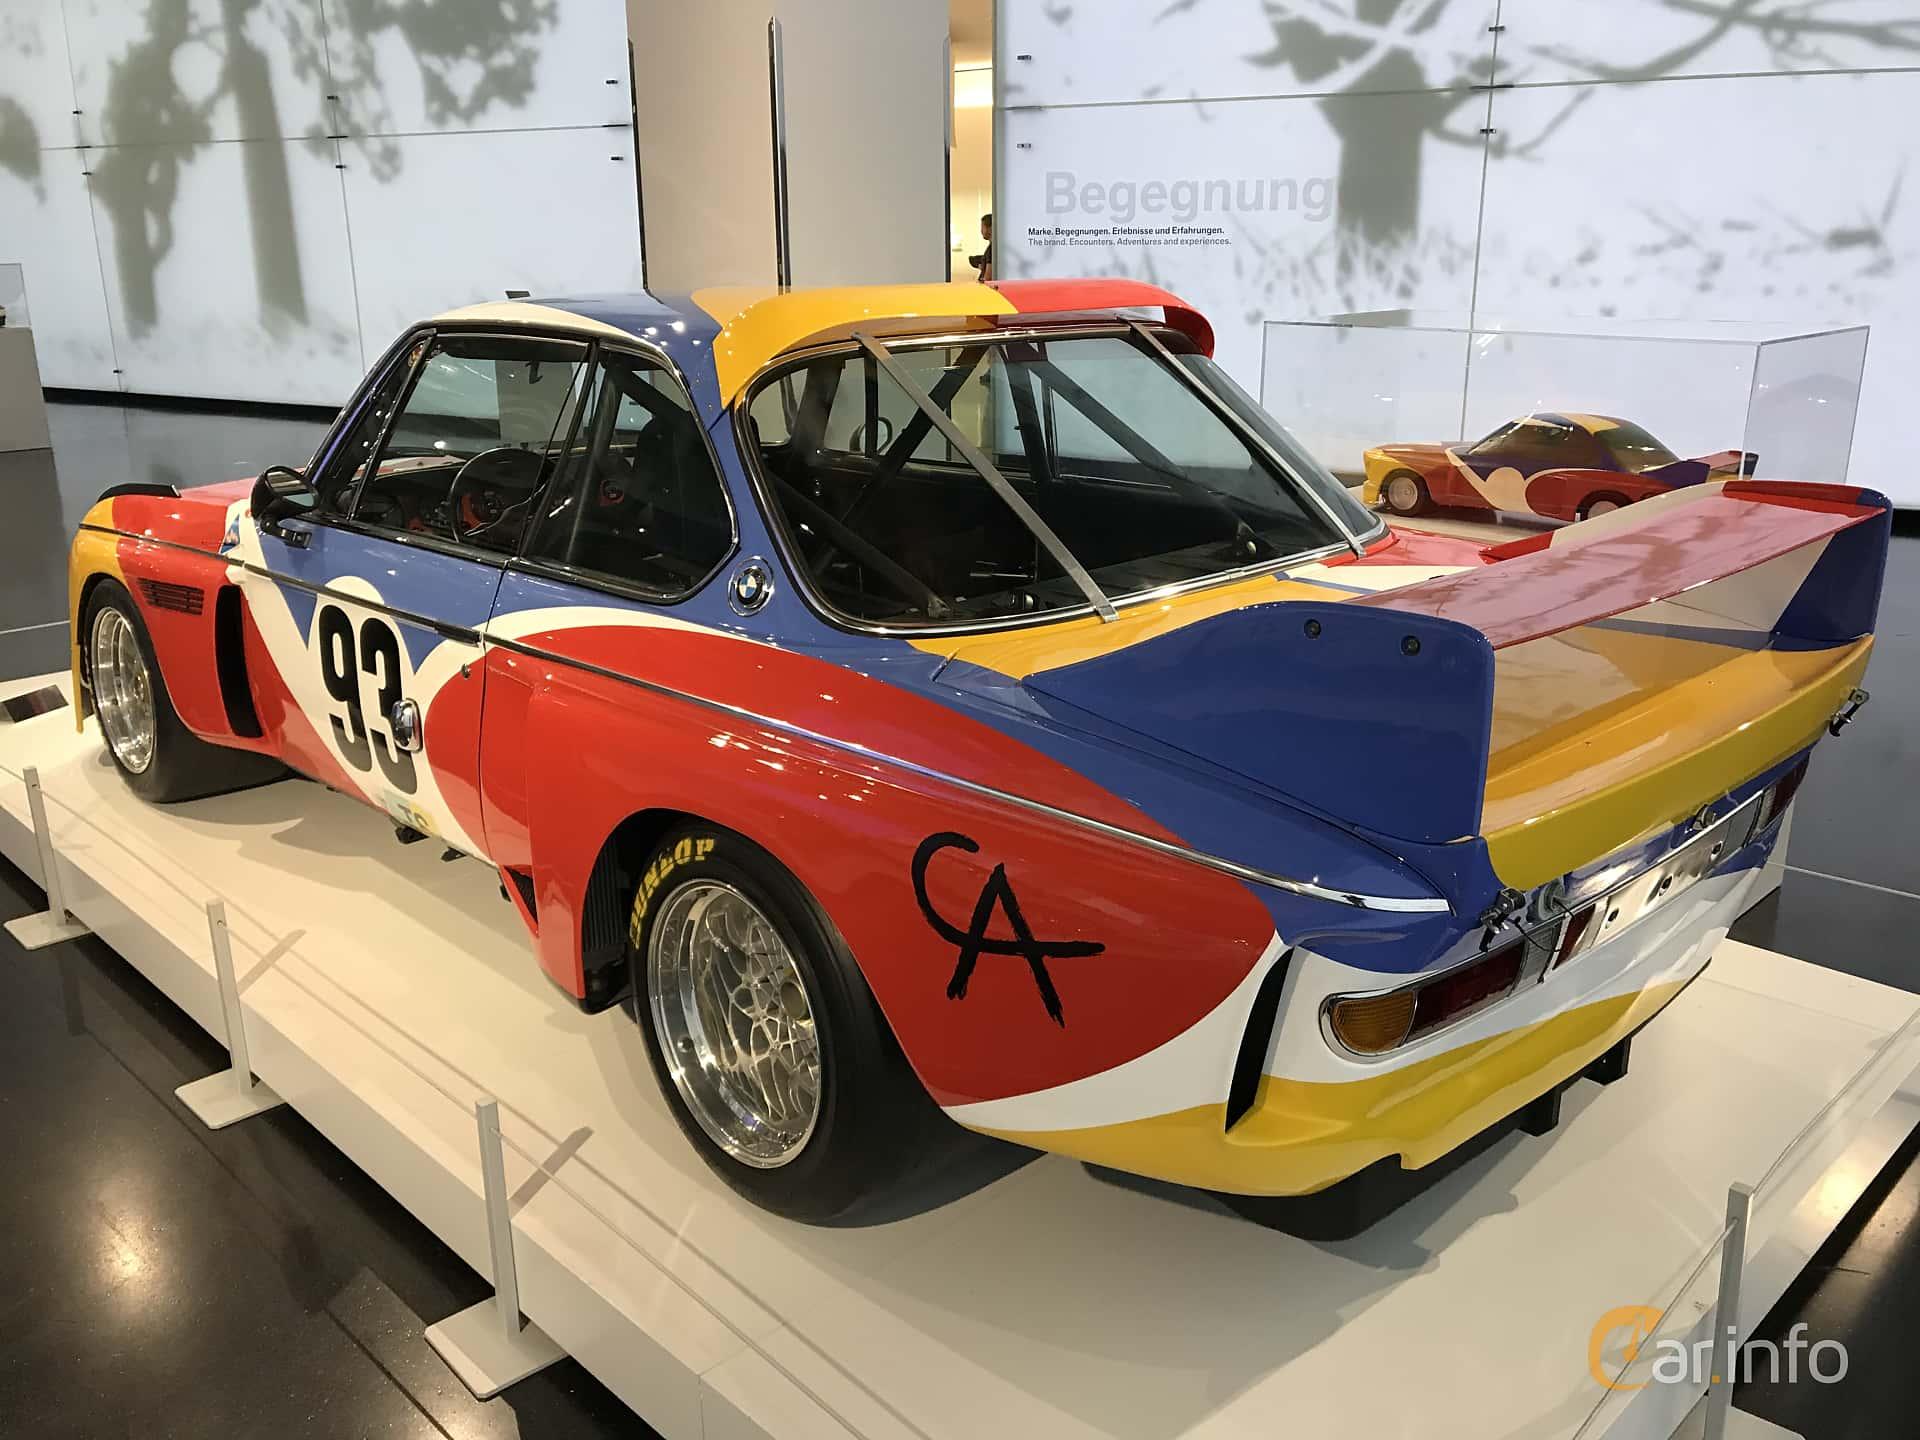 BMW 3.0 CSL Group 5  Manual, 487hp, 1975